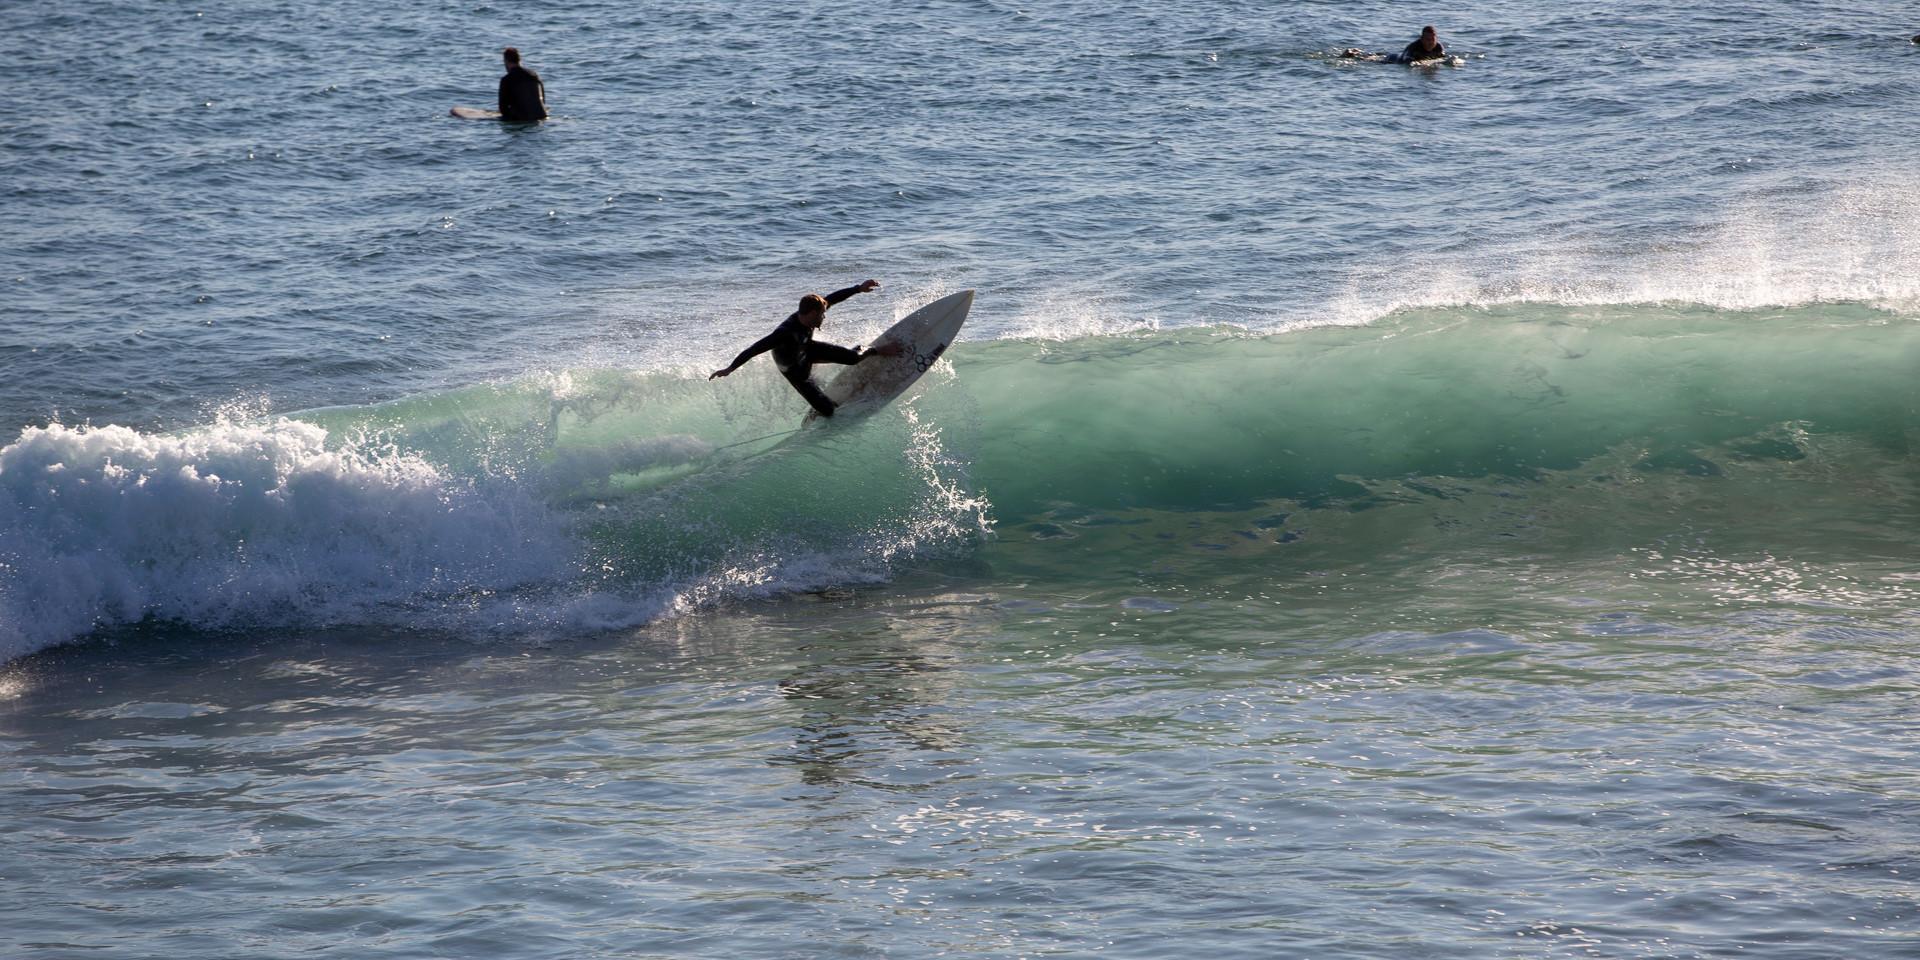 Pacific Coast Highway Surfers, Malibu CA